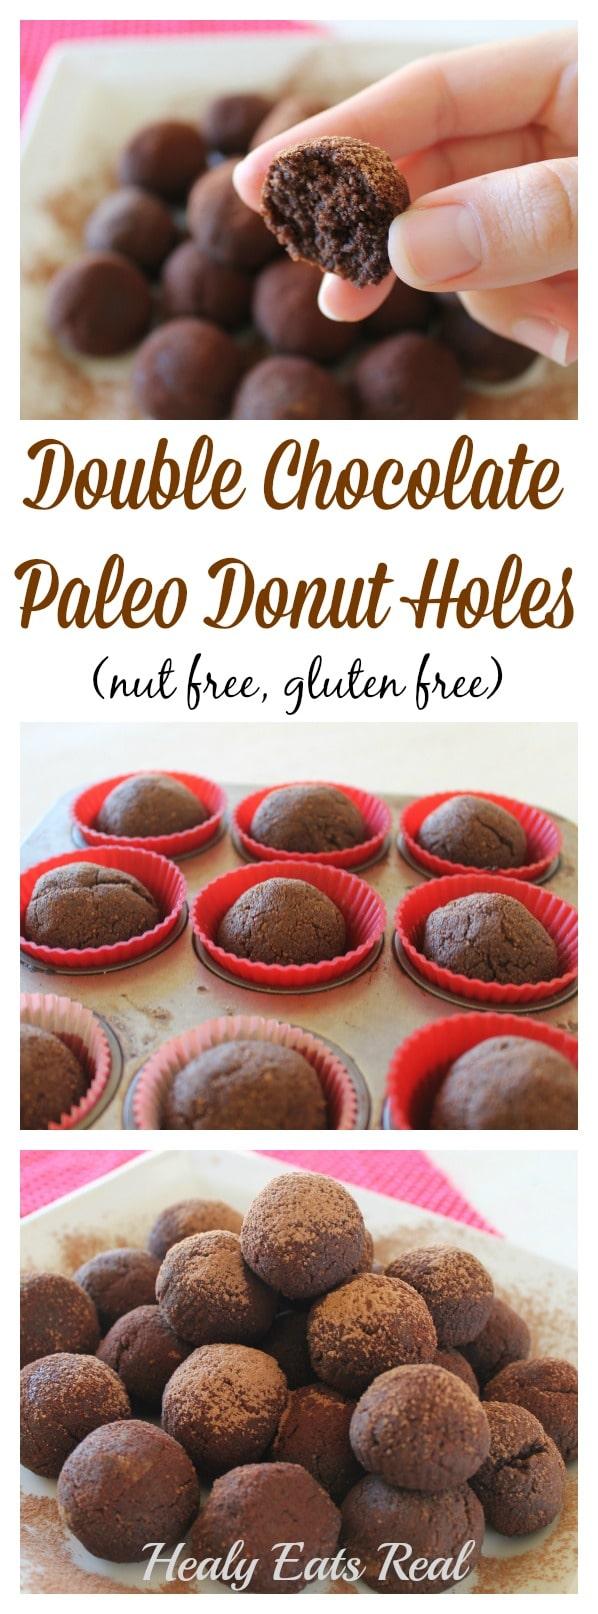 Chocolate Paleo Donut Holes